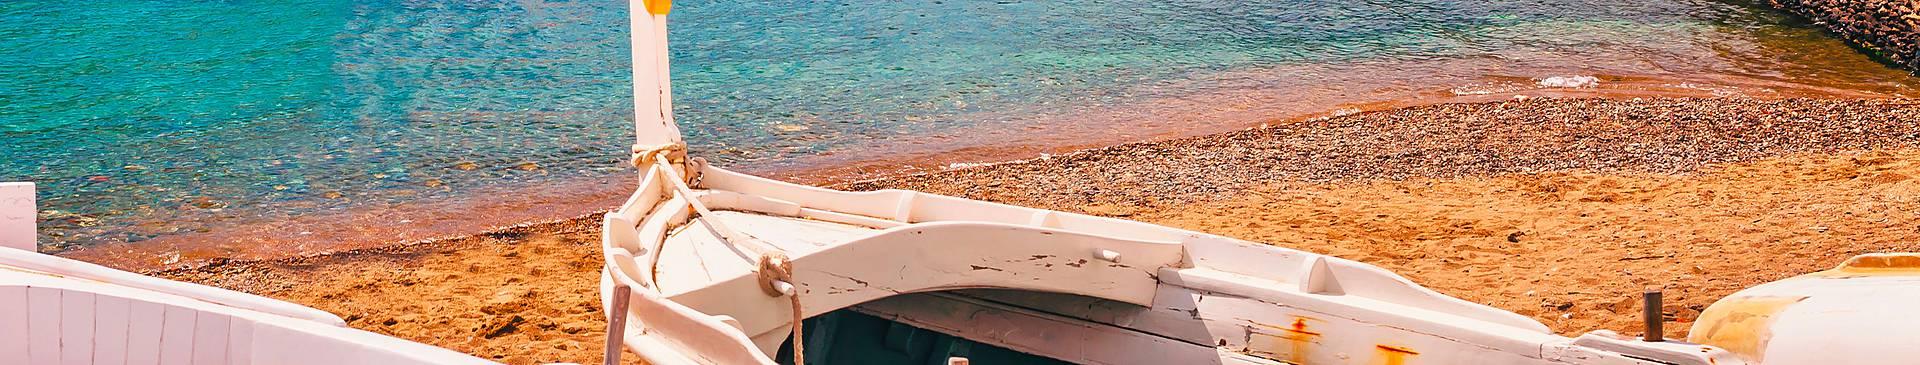 Spain Beach Vacations